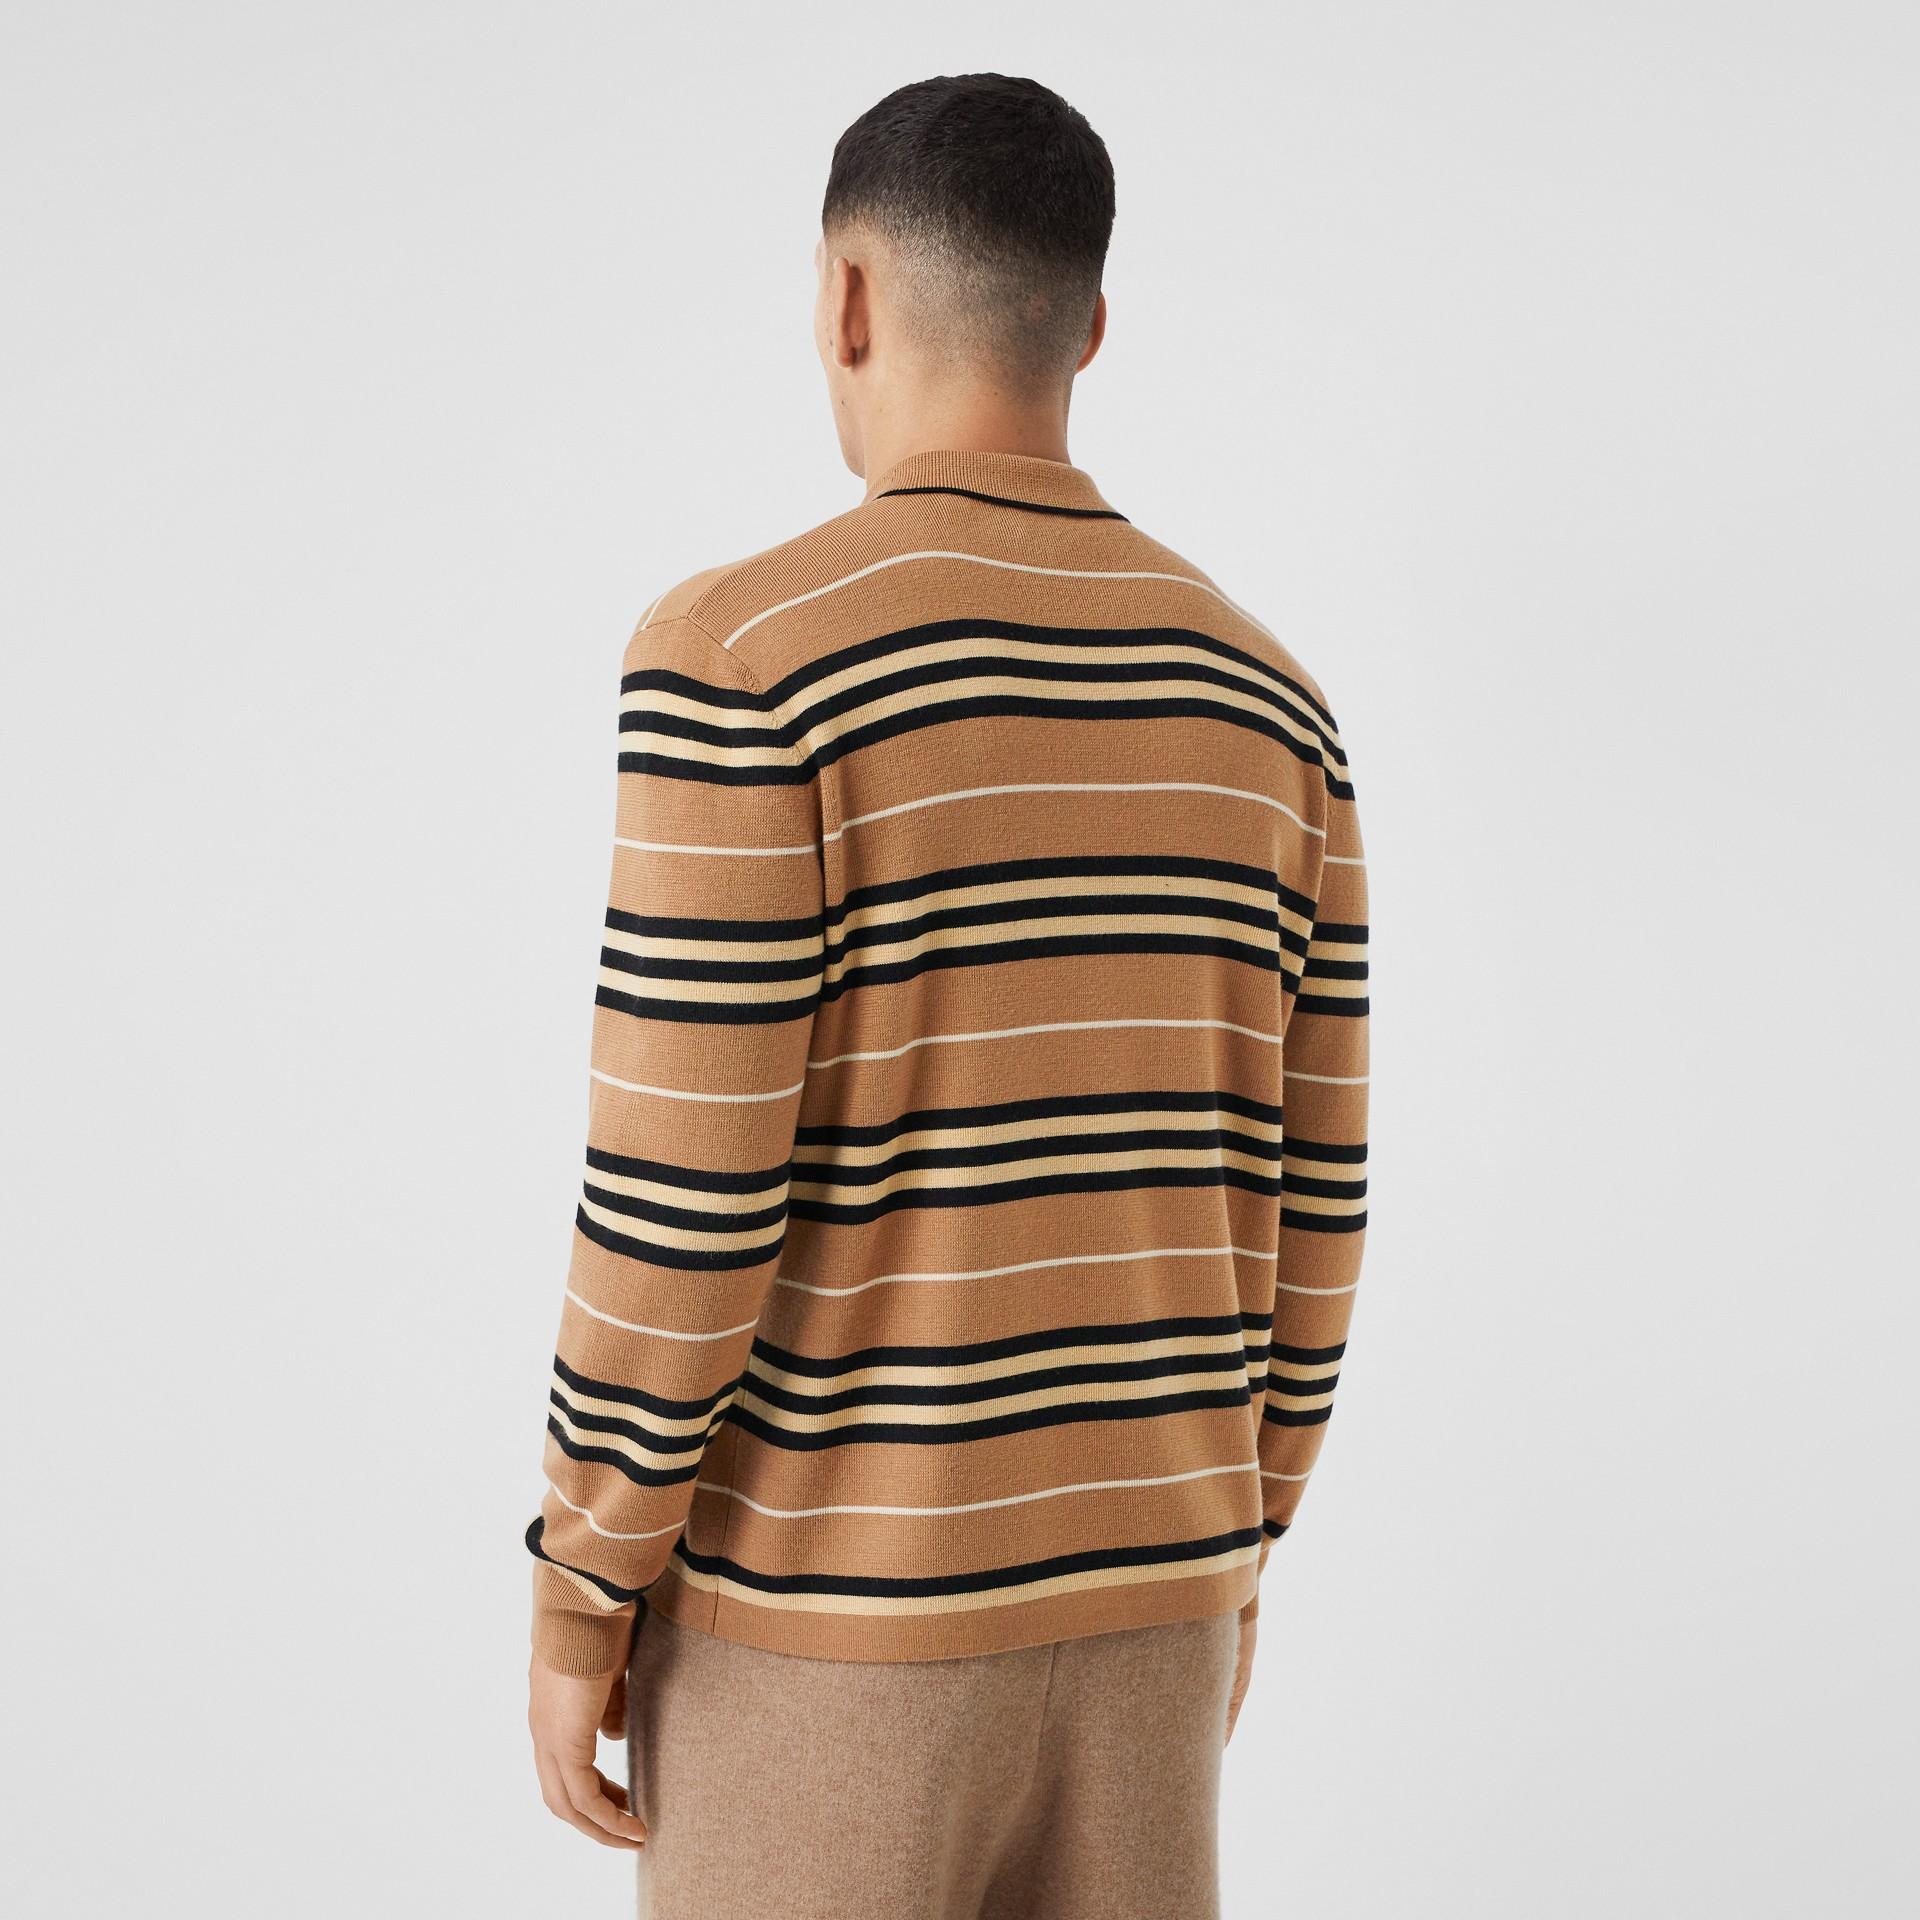 Long-sleeve Icon Stripe Merino Wool Polo Shirt in Warm Walnut - Men | Burberry United Kingdom - gallery image 2